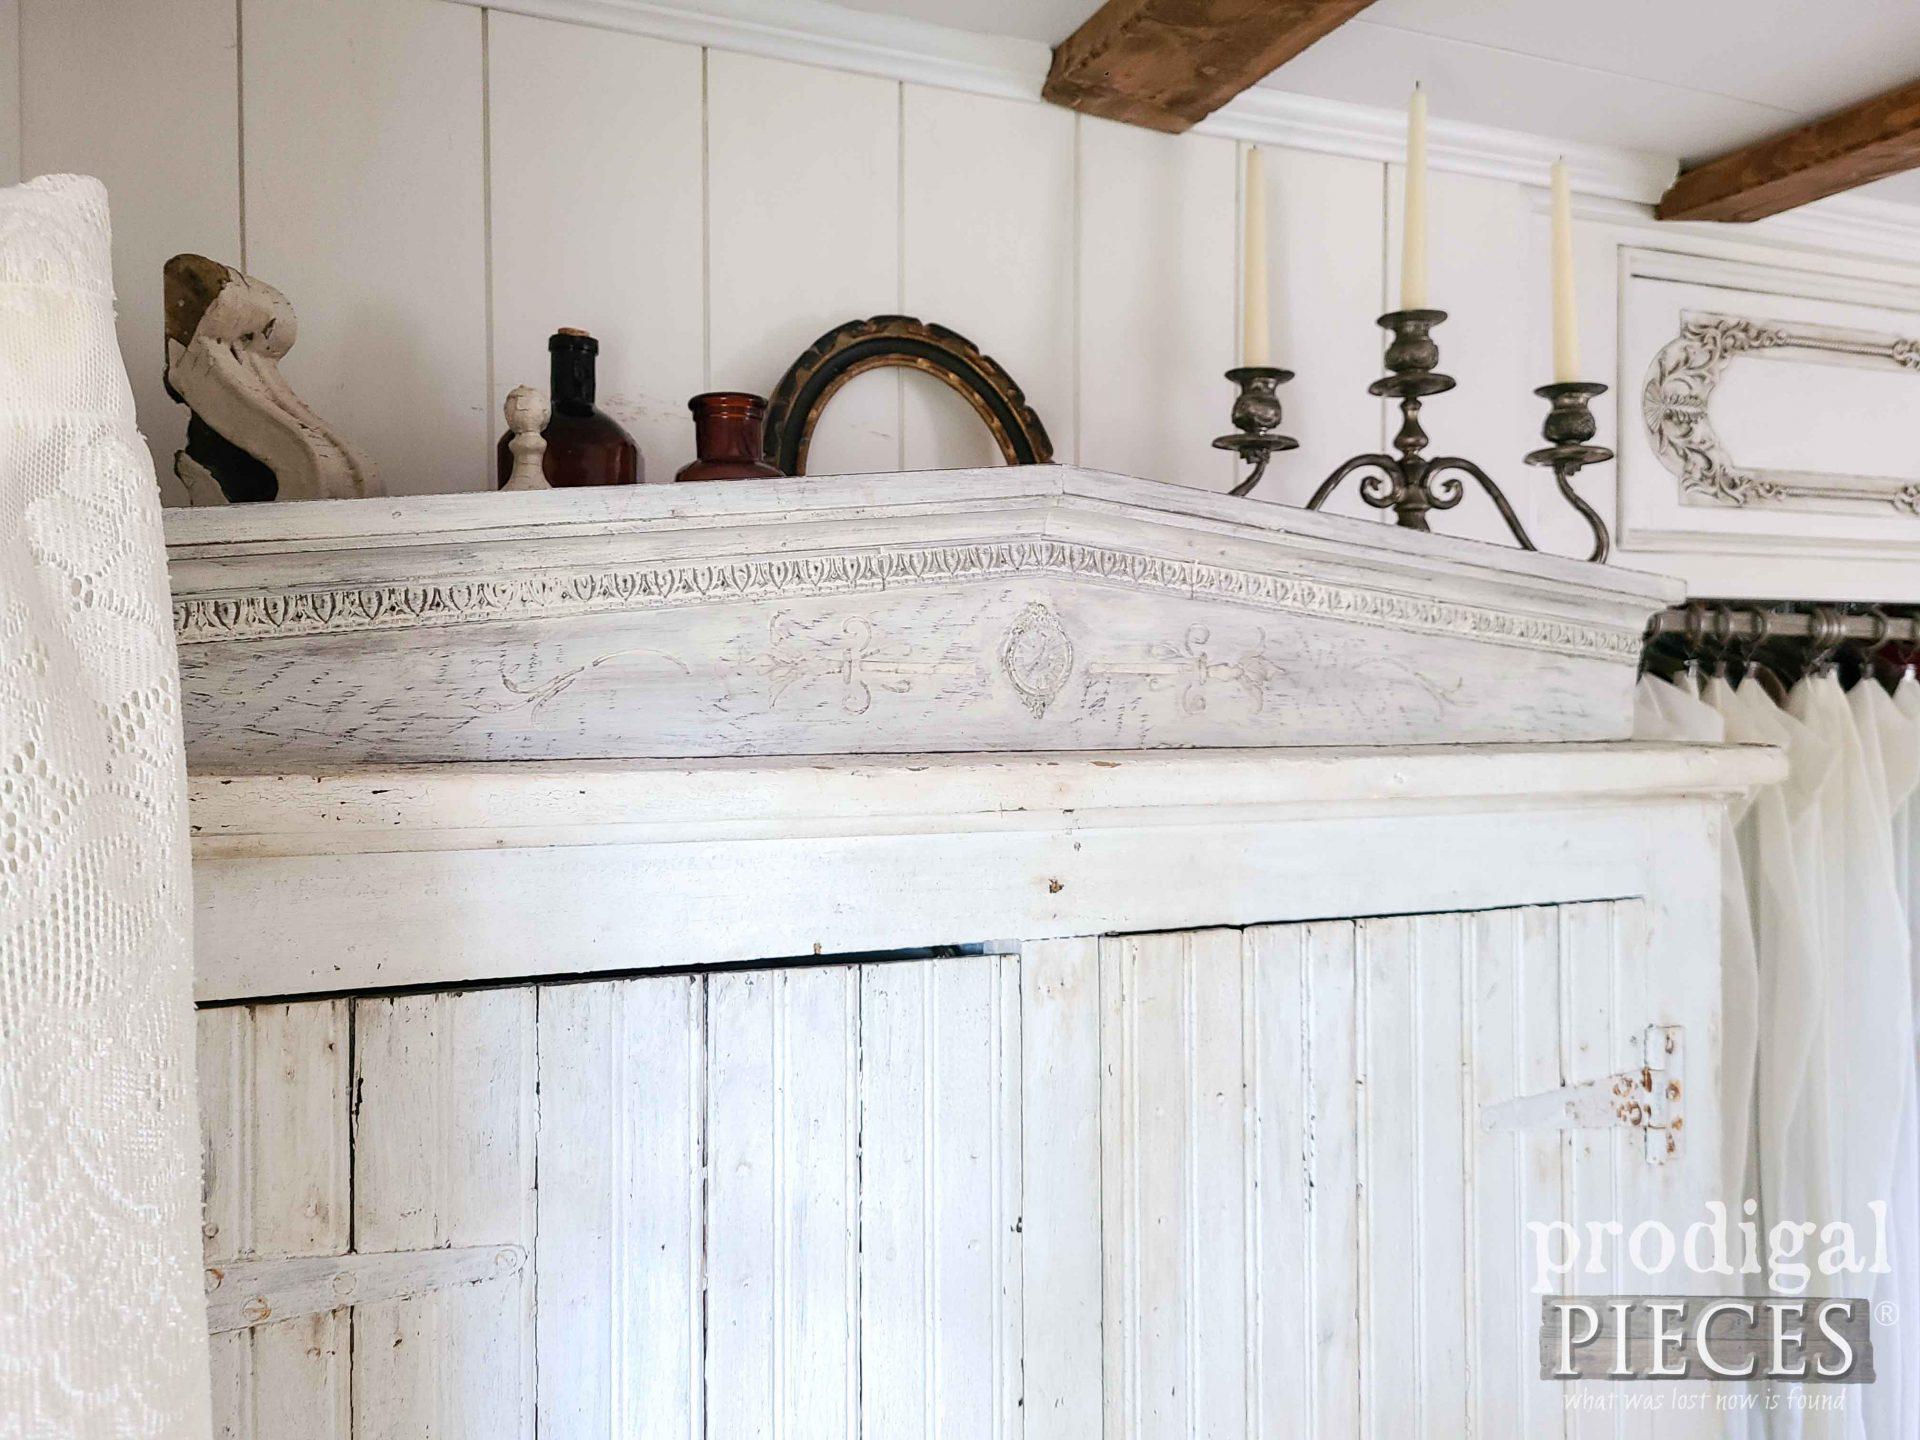 Antique Farmhouse Bedroom with DIY Decor by Larissa of Prodigal Pieces | prodigalpieces.com #prodigalpieces #rustic #vintage #home #farmhouse